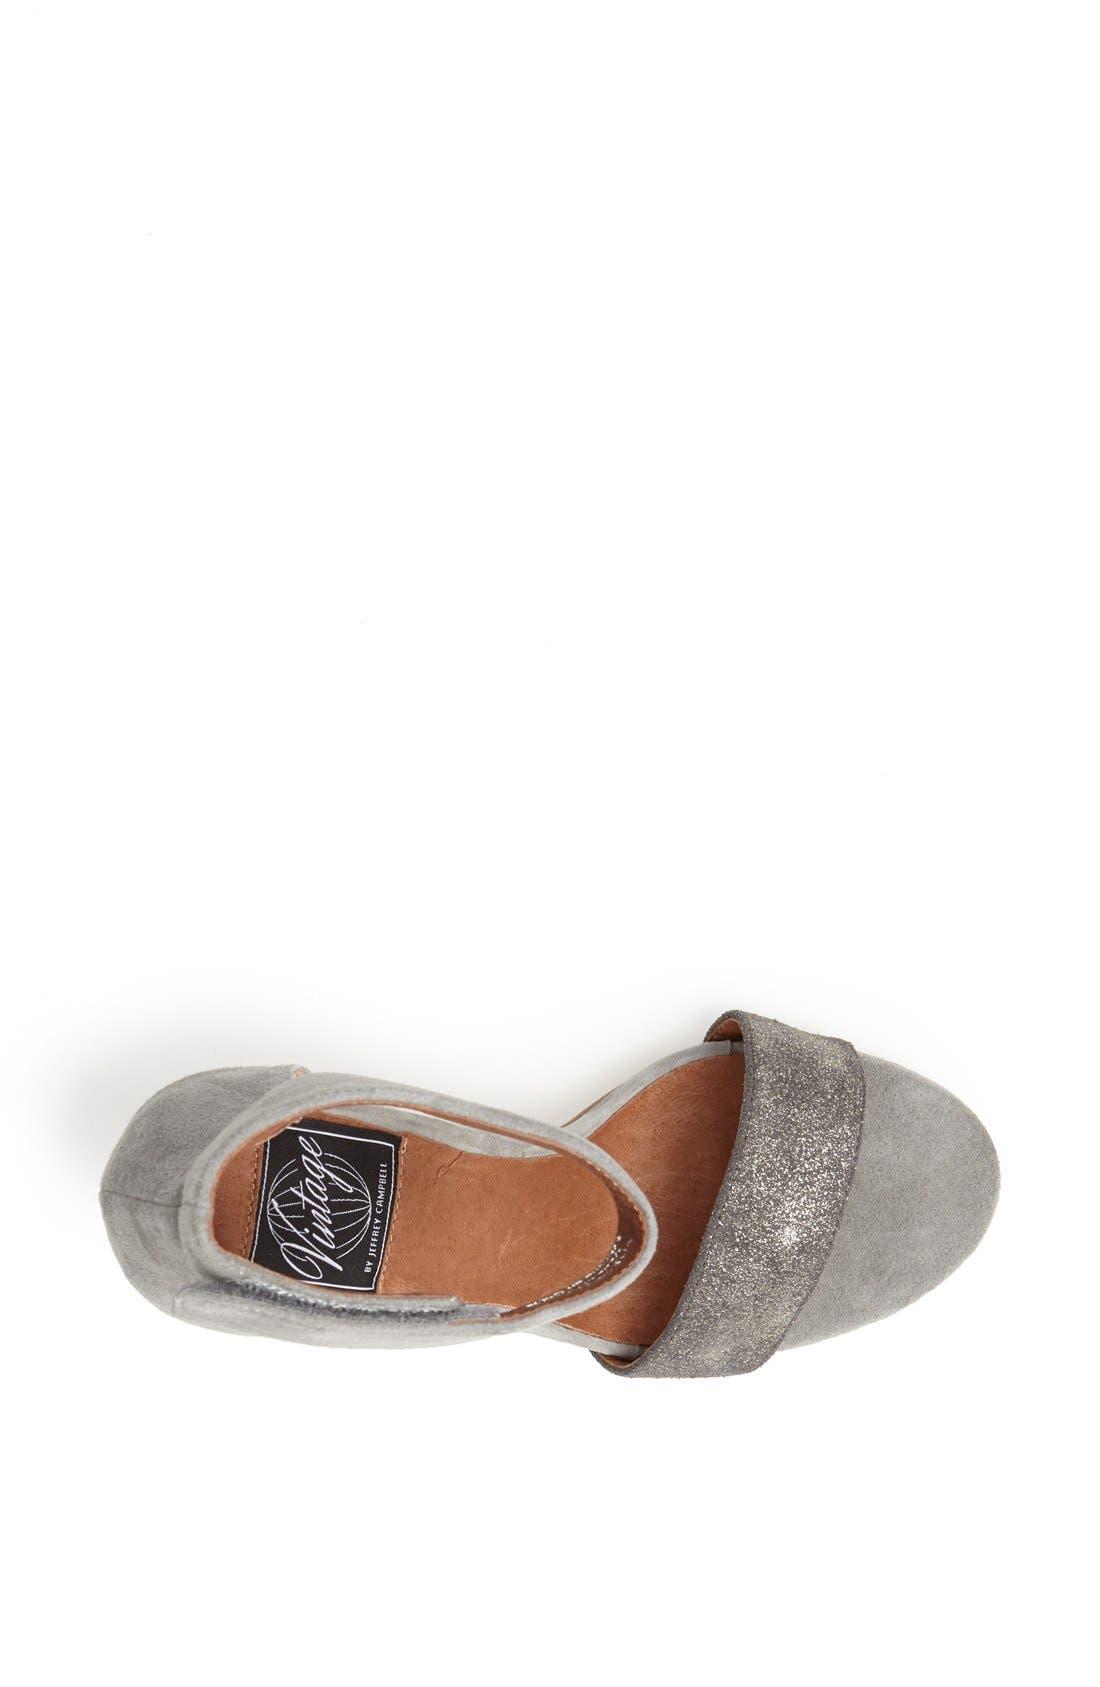 Alternate Image 3  - Jeffrey Campbell 'Foxtrot' Sandal